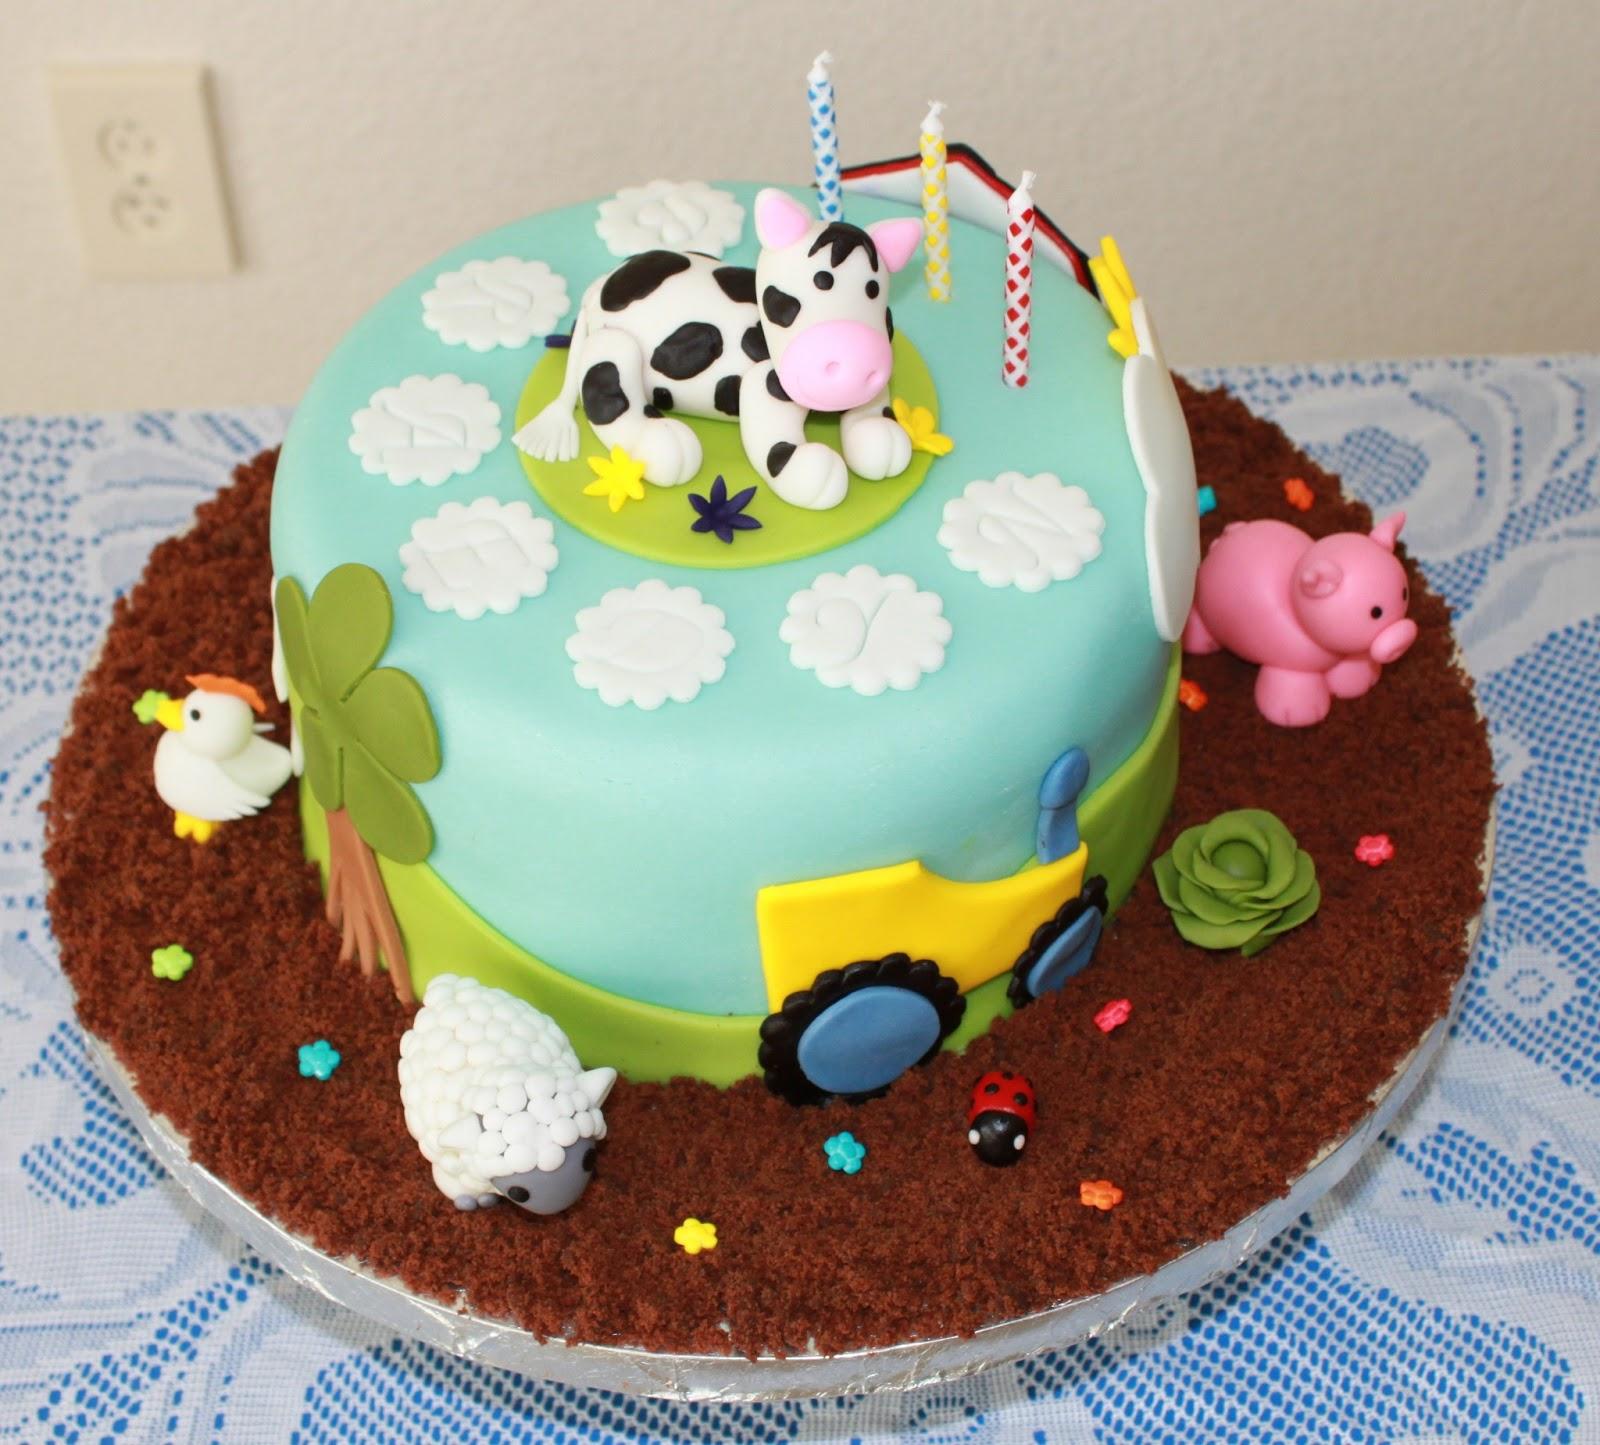 Cakes Bakes N More: Farm Themed Birthday Cake